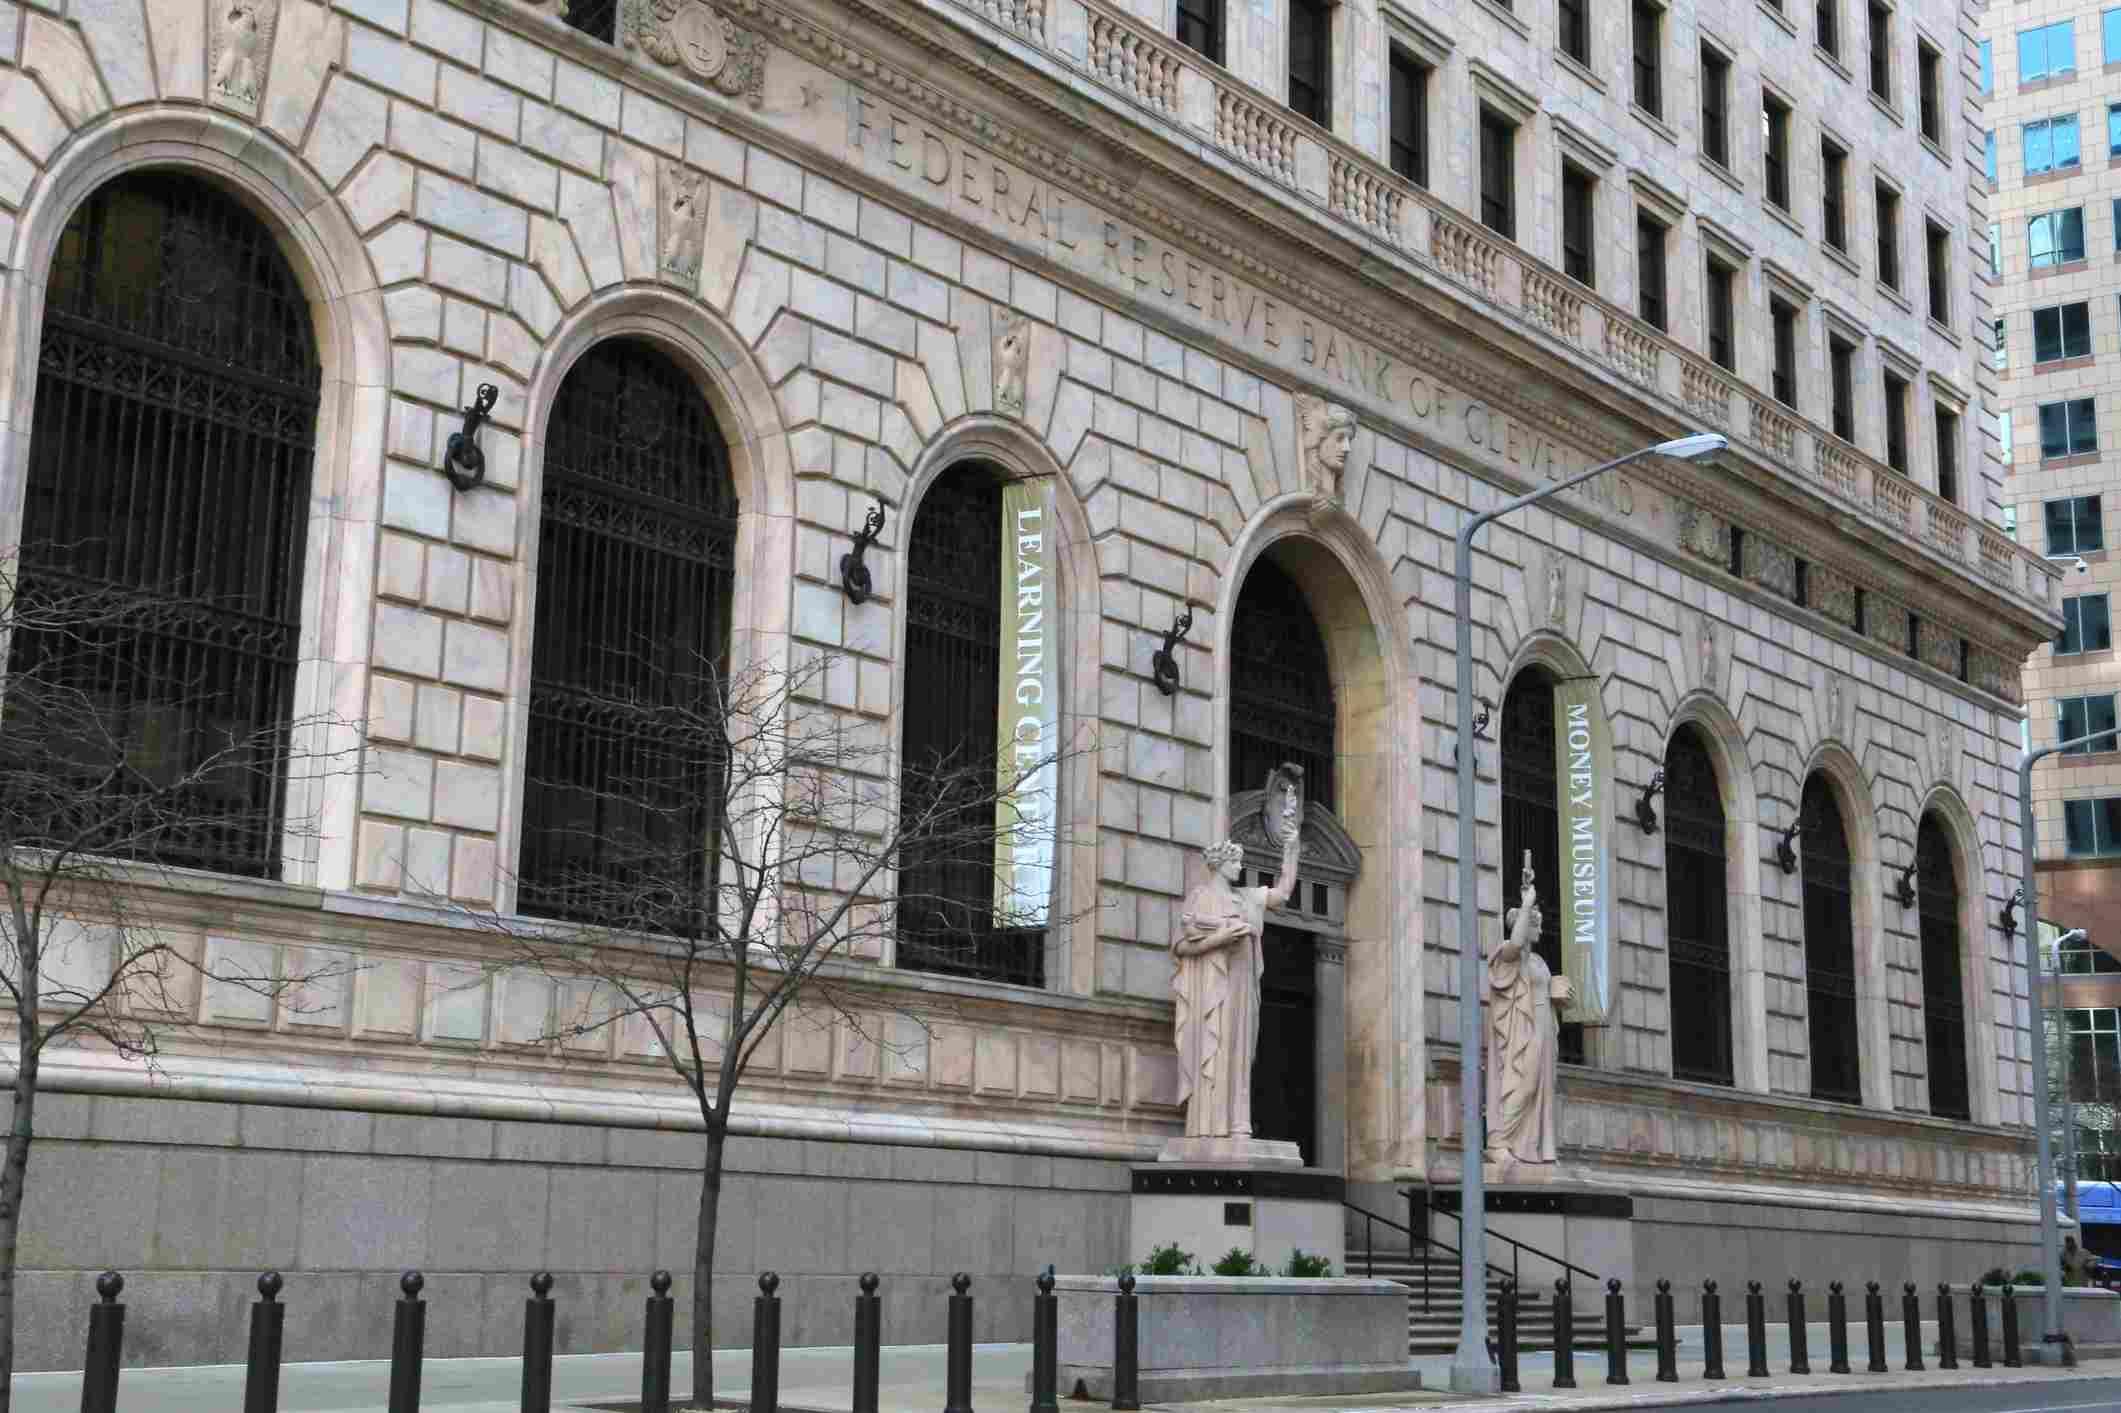 USA, Ohio, Cleveland, US Federal Reserve Bank